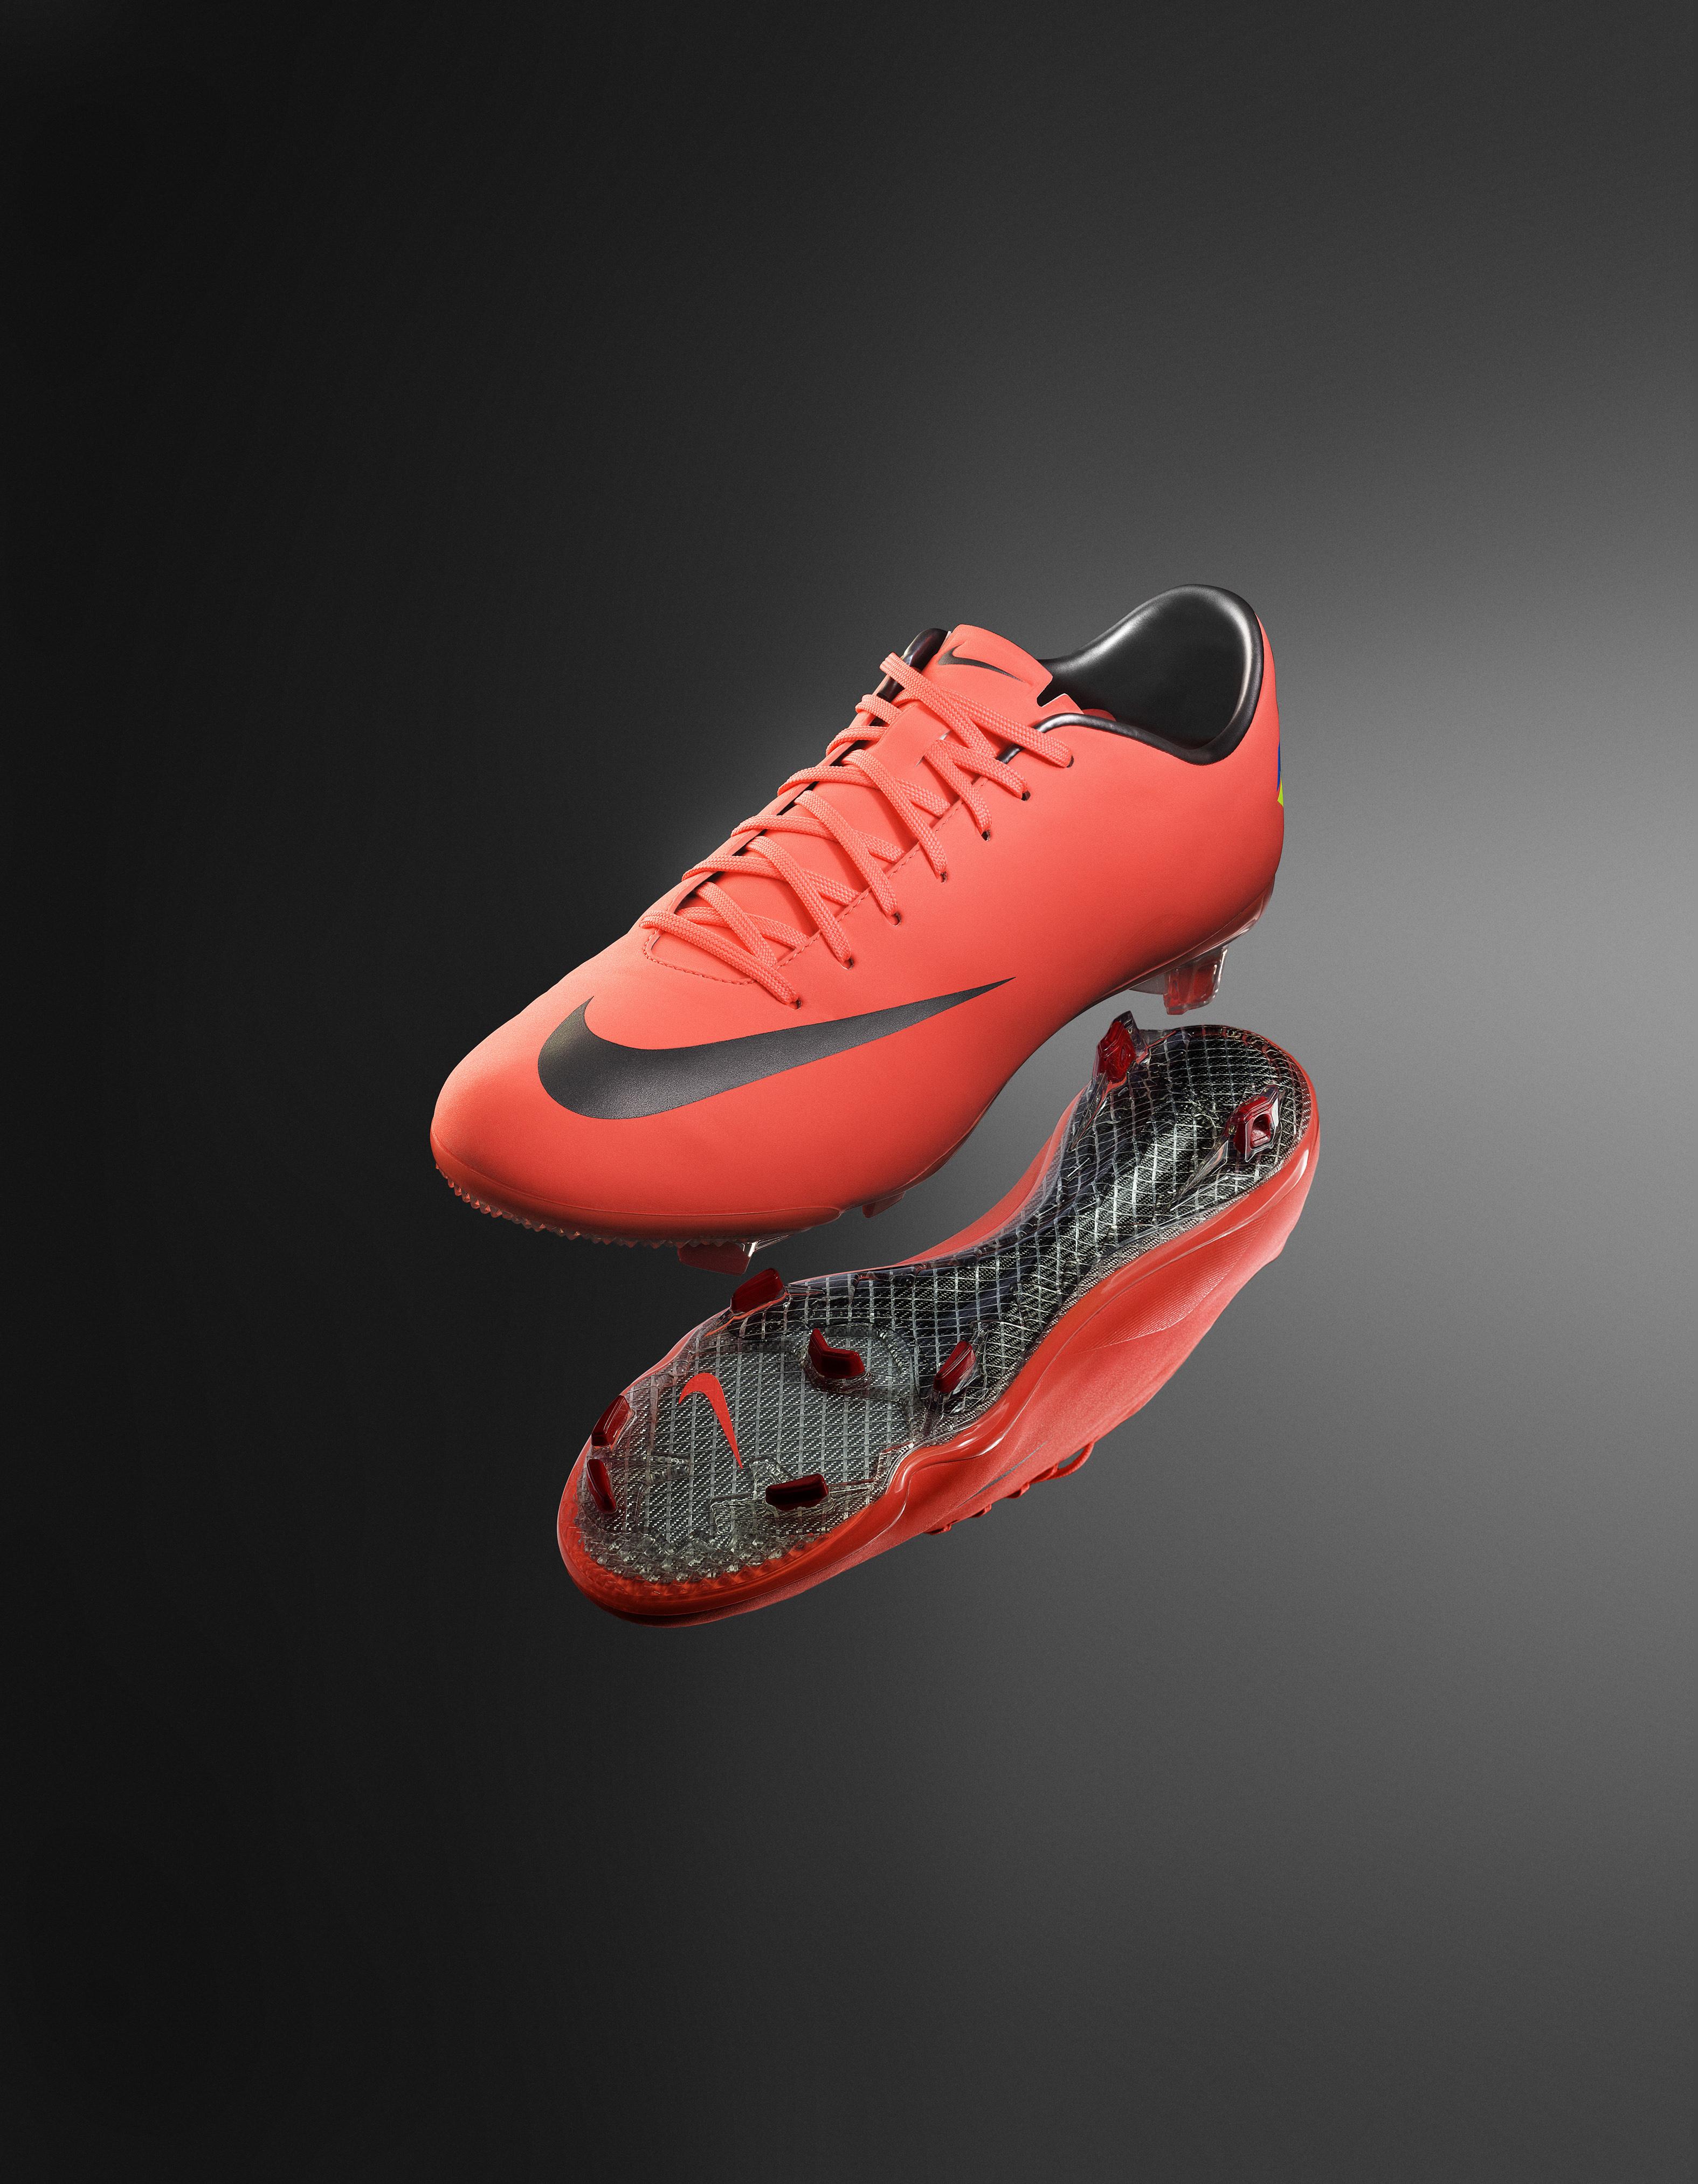 Nike Vapor VIII Soccer Shoe